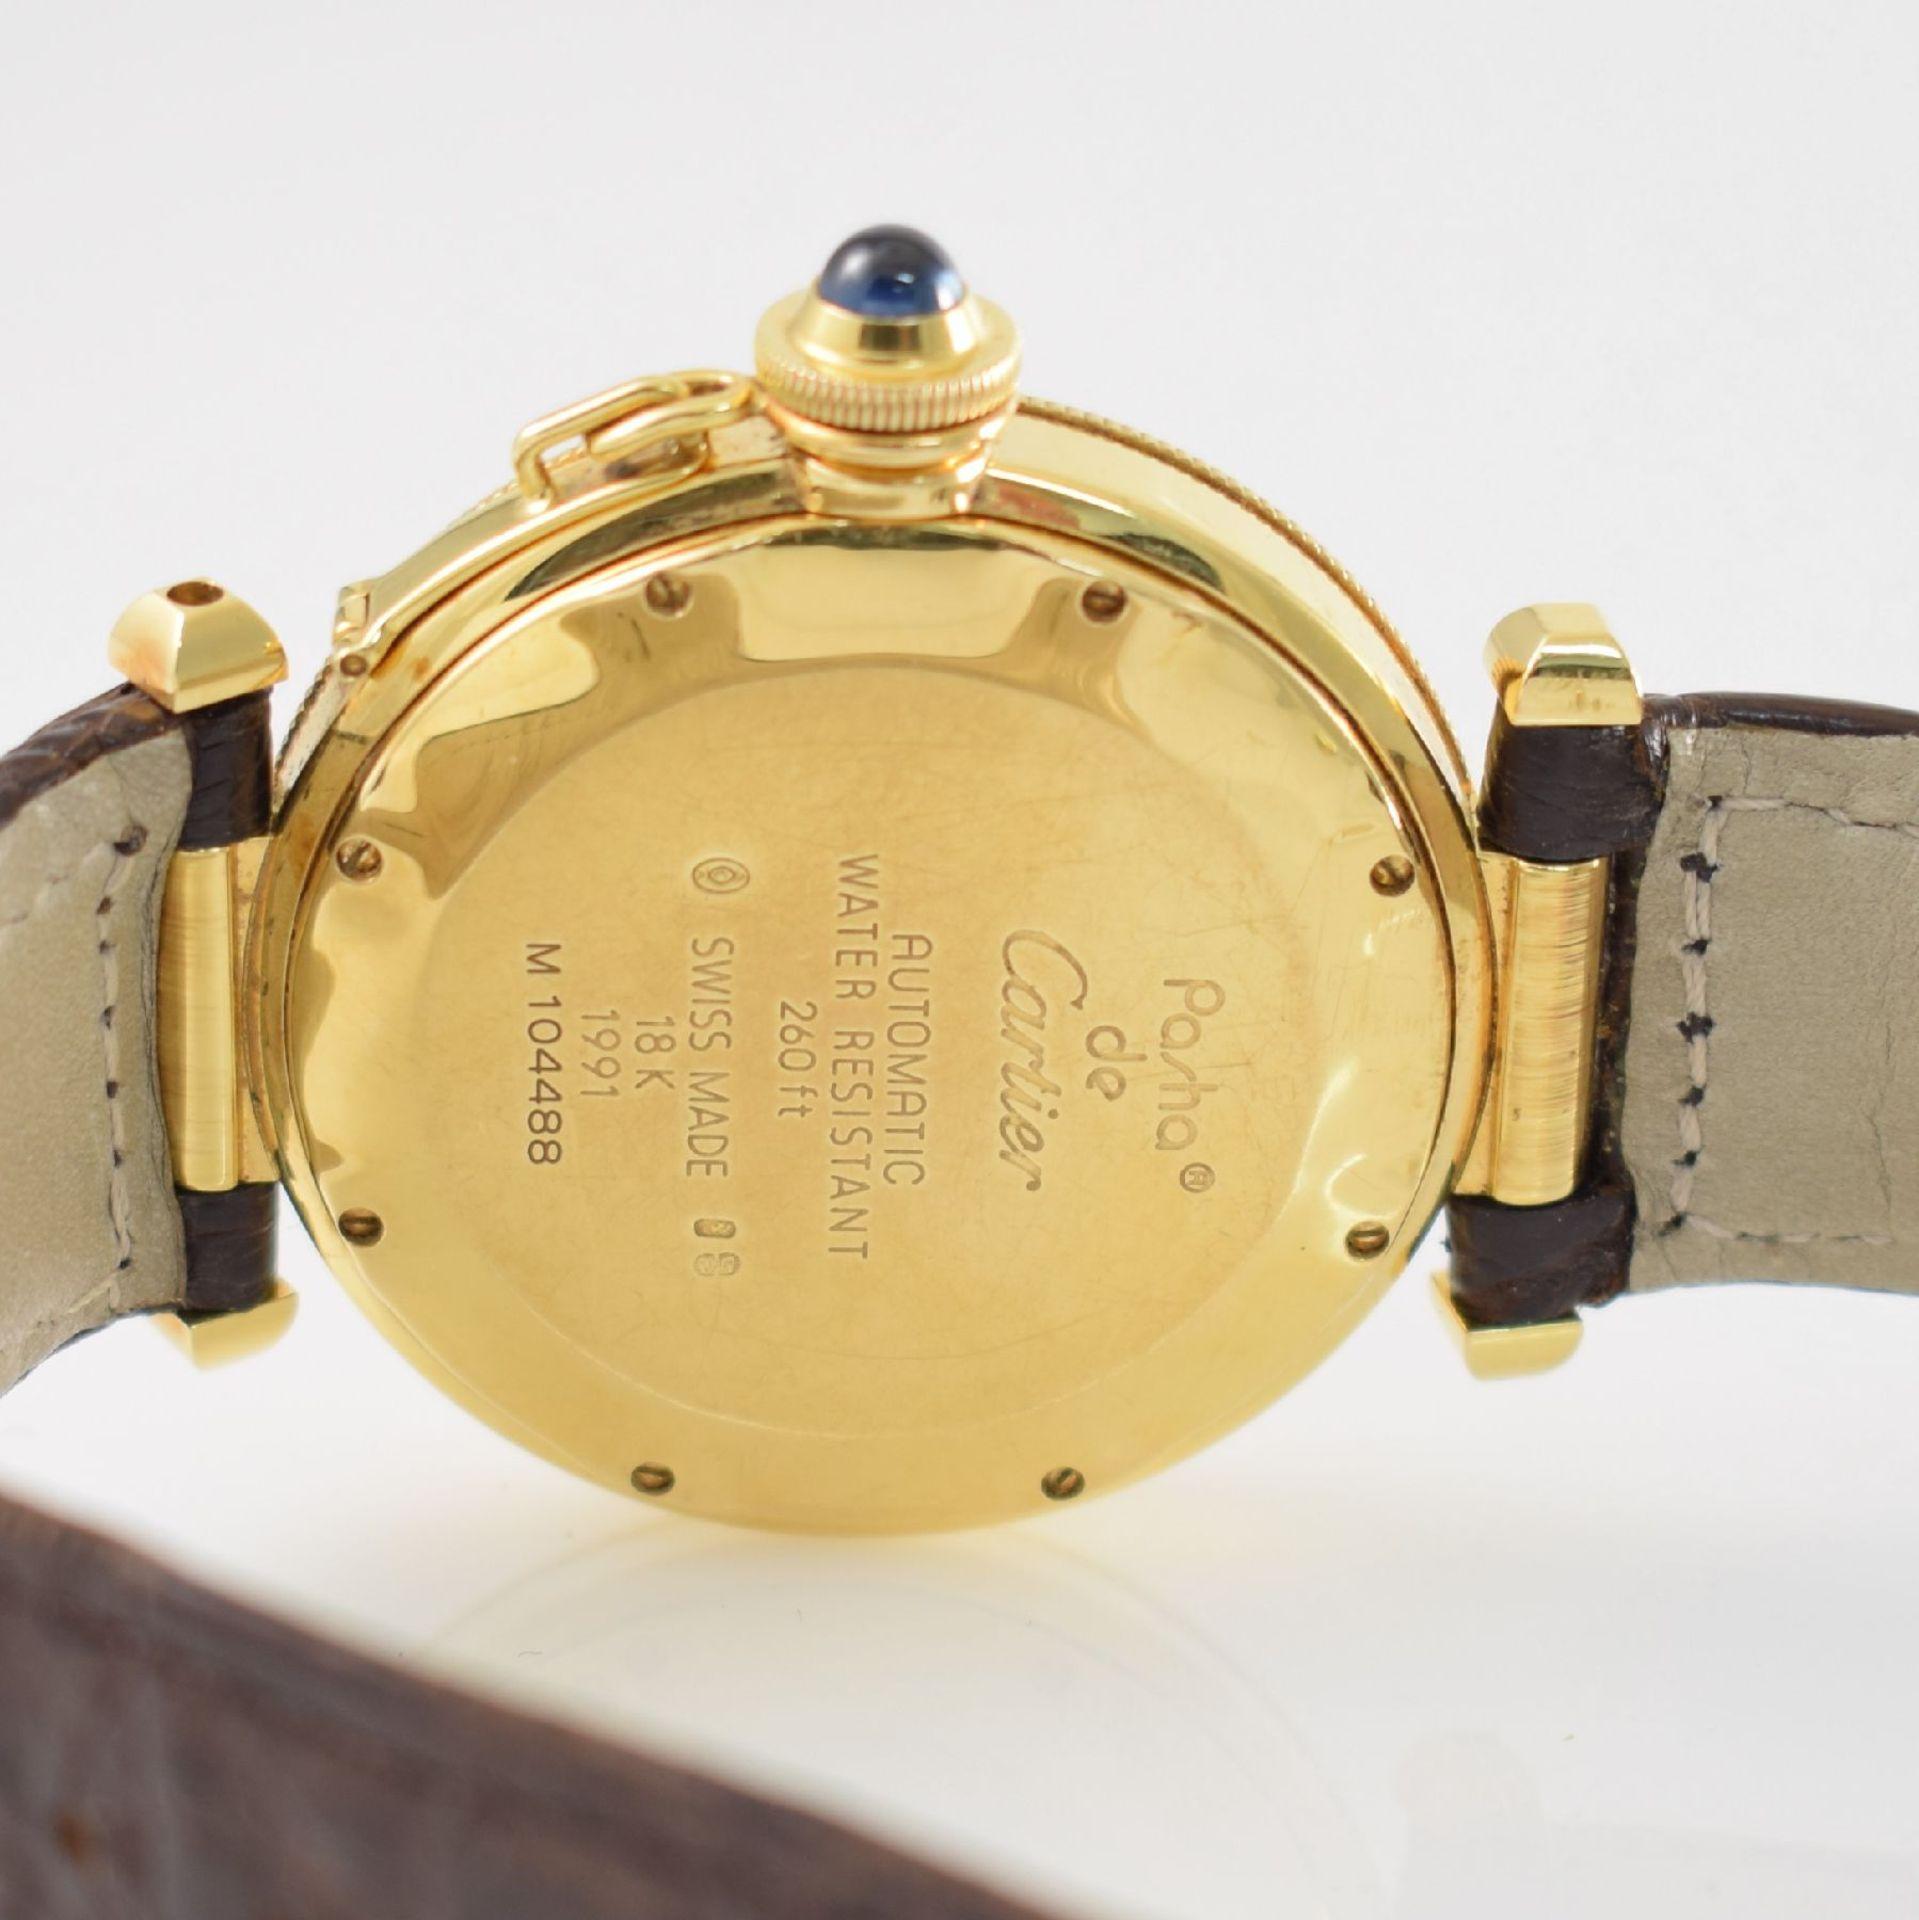 CARTIER Armbanduhr Serie Pasha in GG 750/000, Automatik, Schweiz um 1990, Ref. 1991, Lederband m. - Bild 4 aus 7